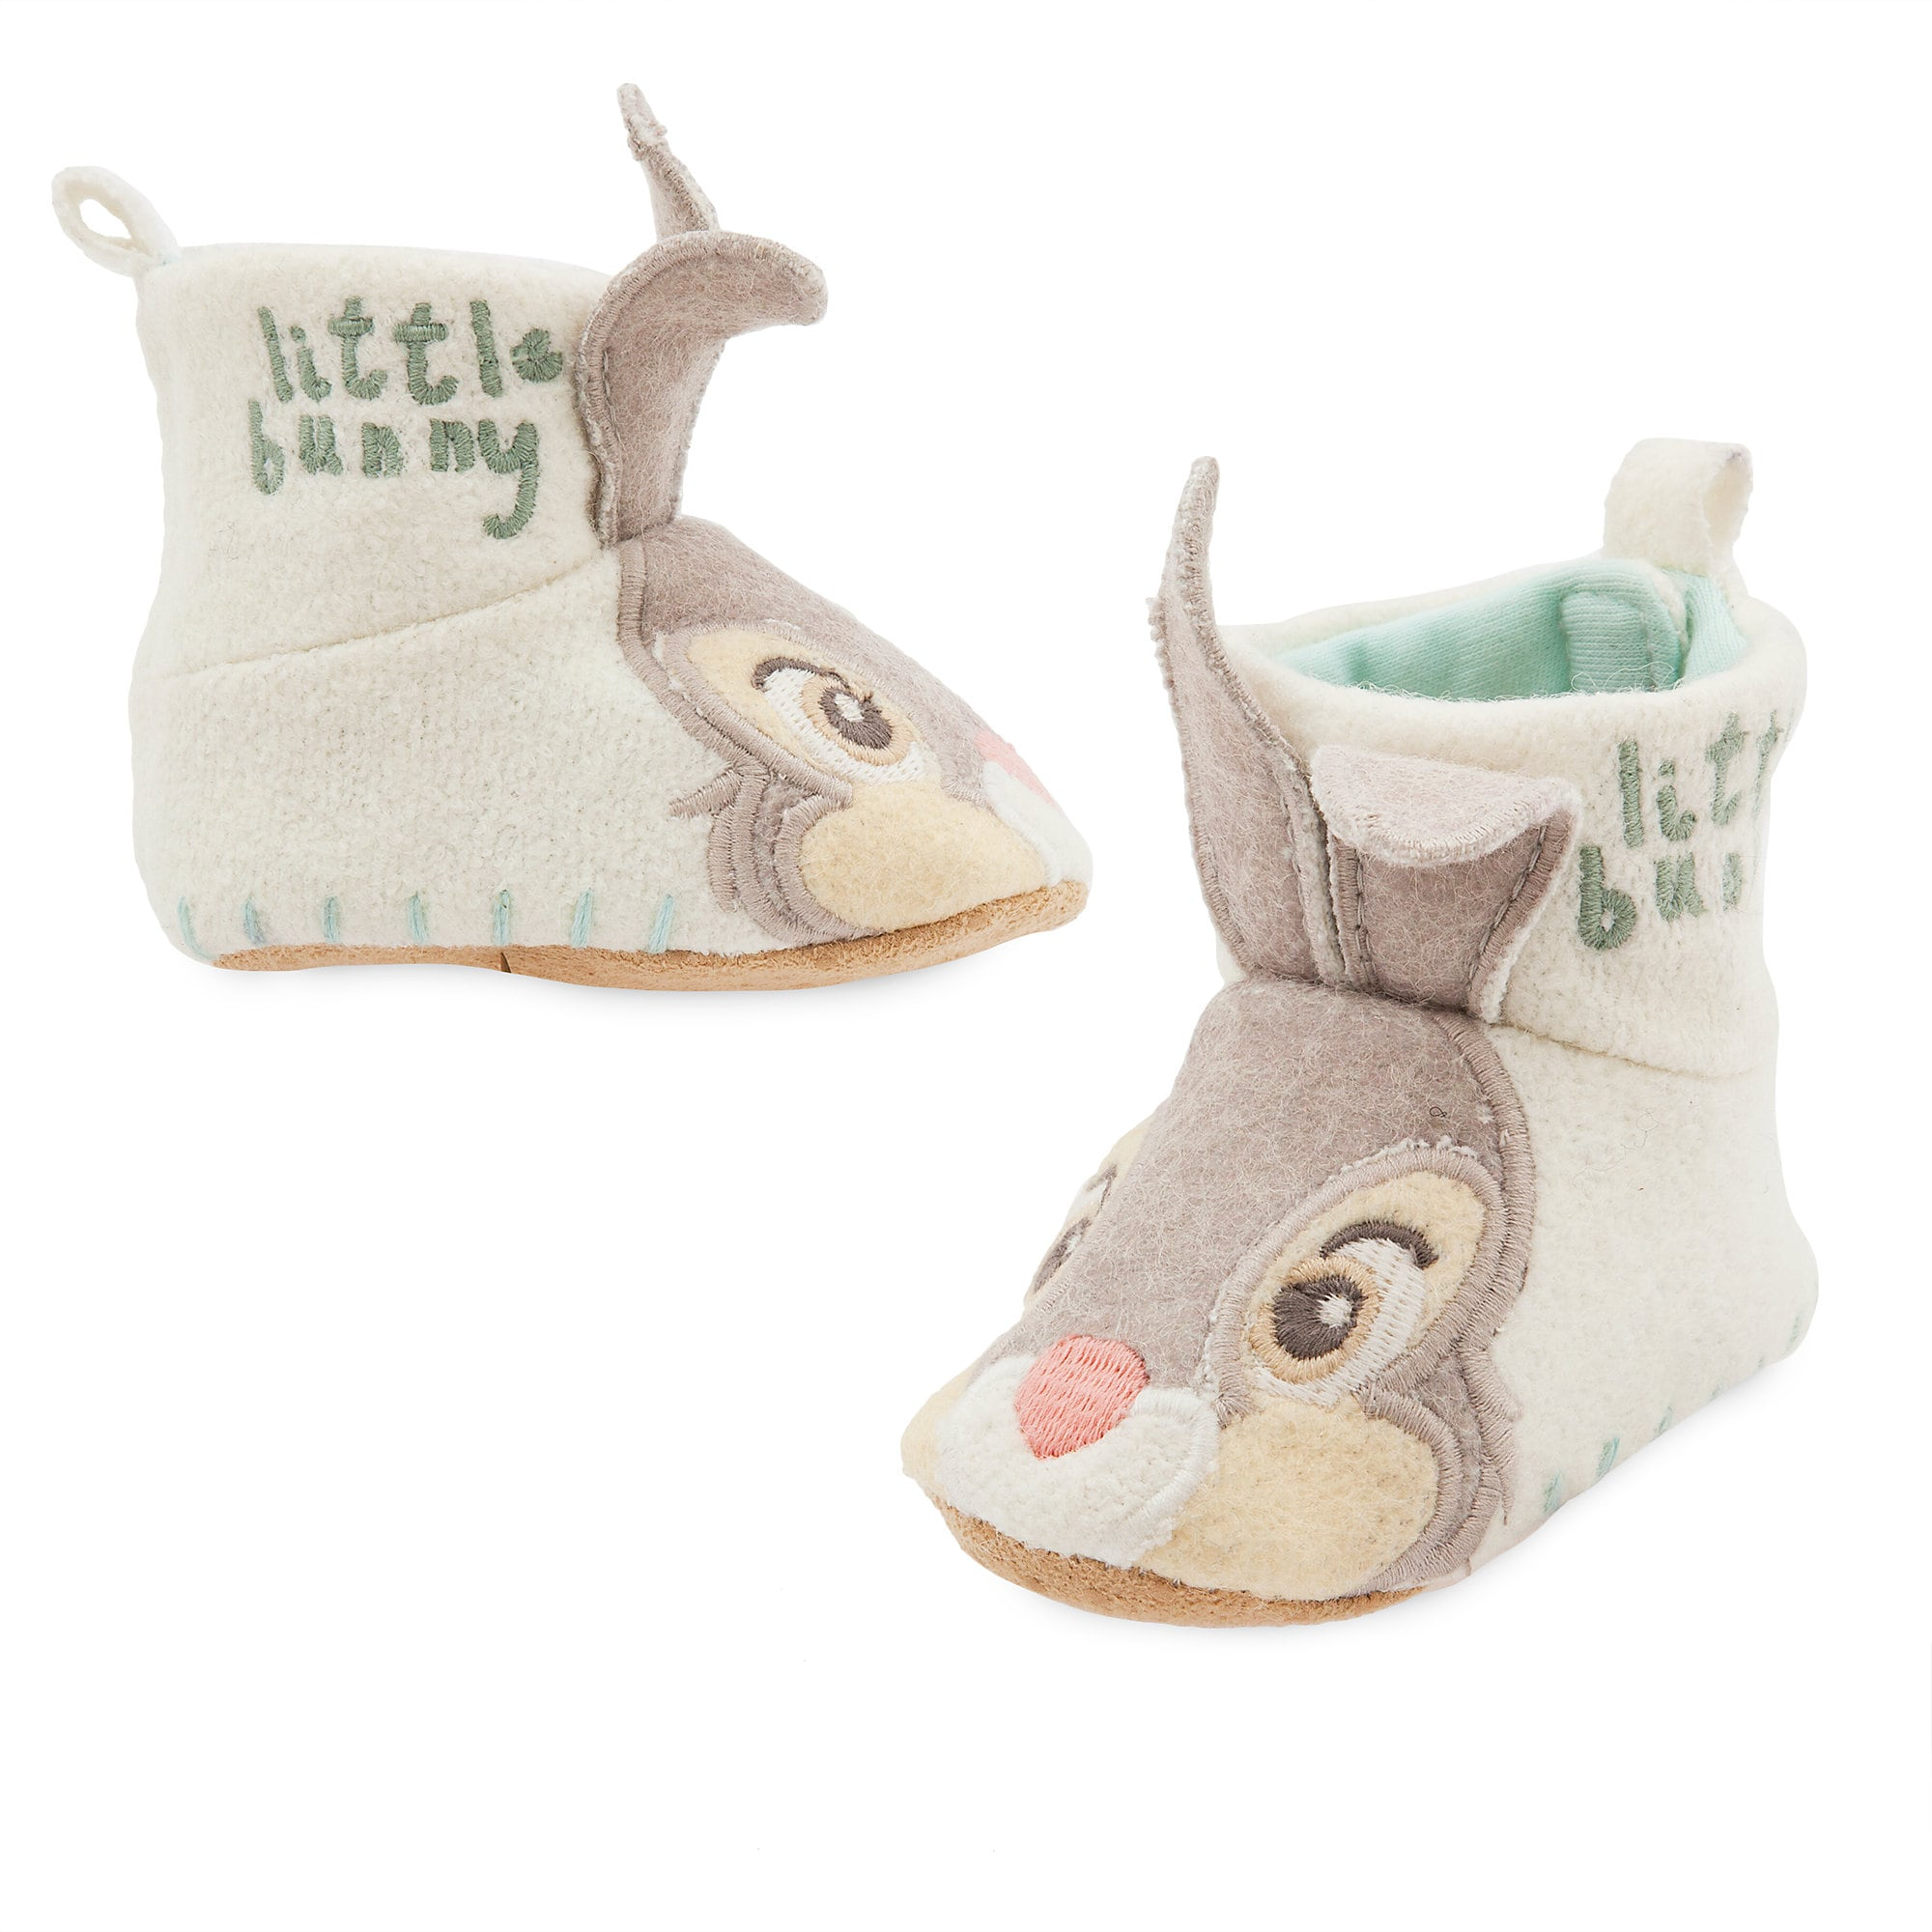 Thumper Plush Slippers for Baby